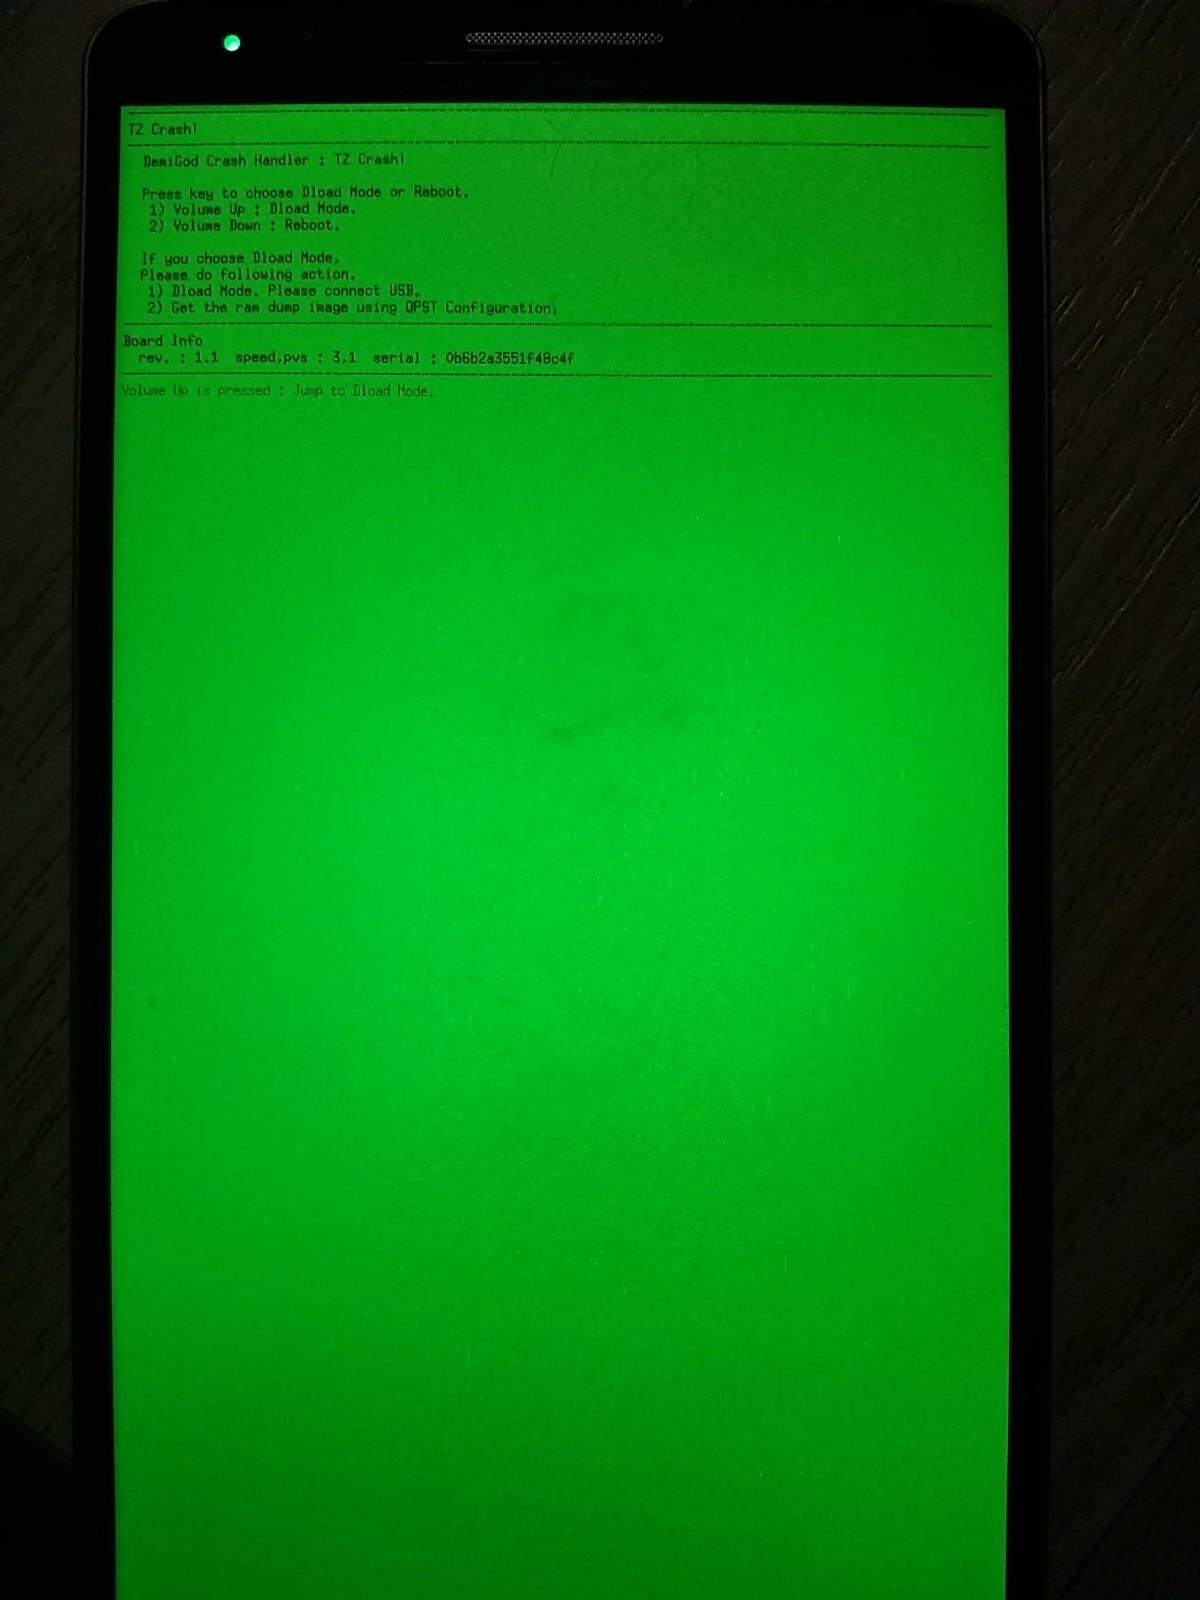 LG G3手机无故突然绿屏(如图1),按任何键无果,取电池重新开机还是进入